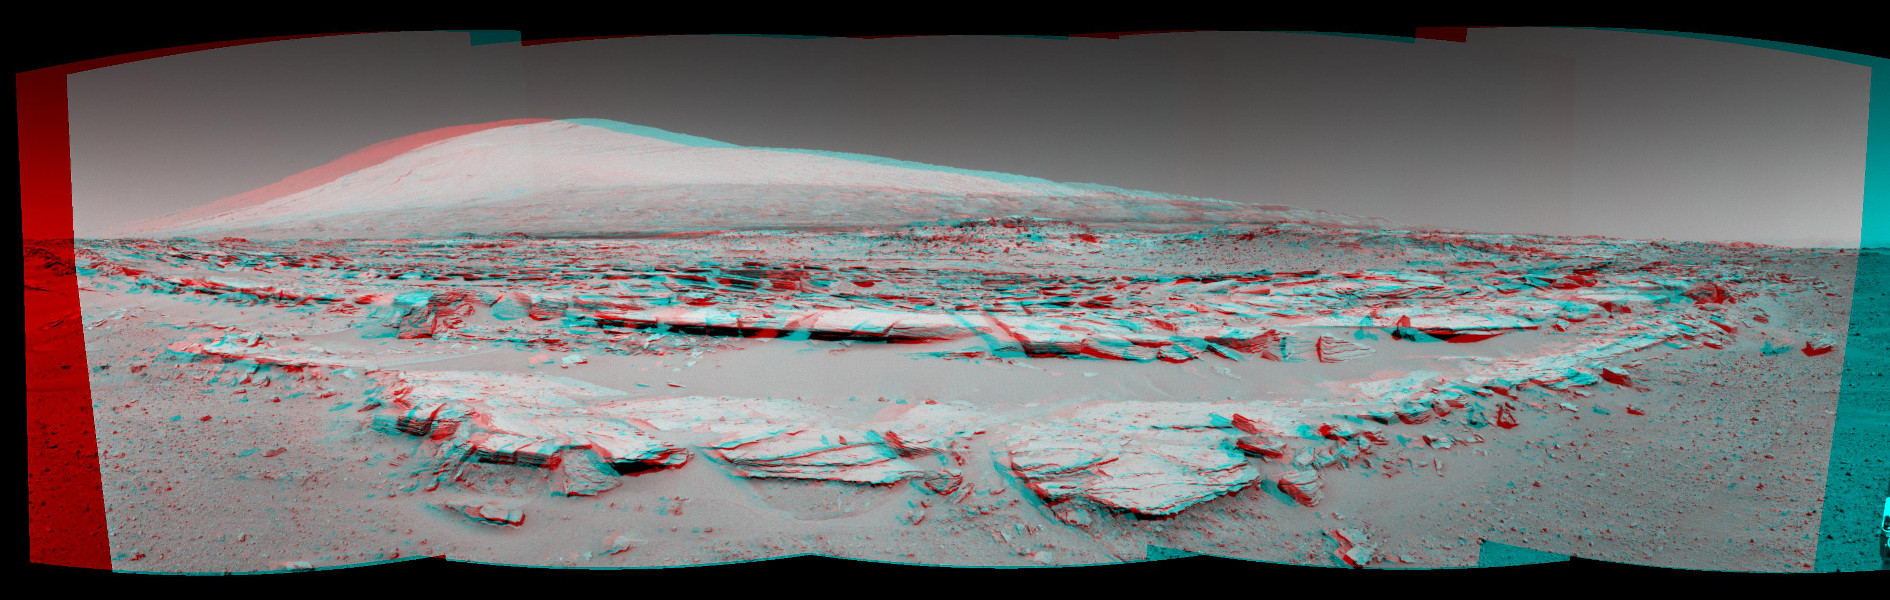 Aeolis Mons à l\'horizon